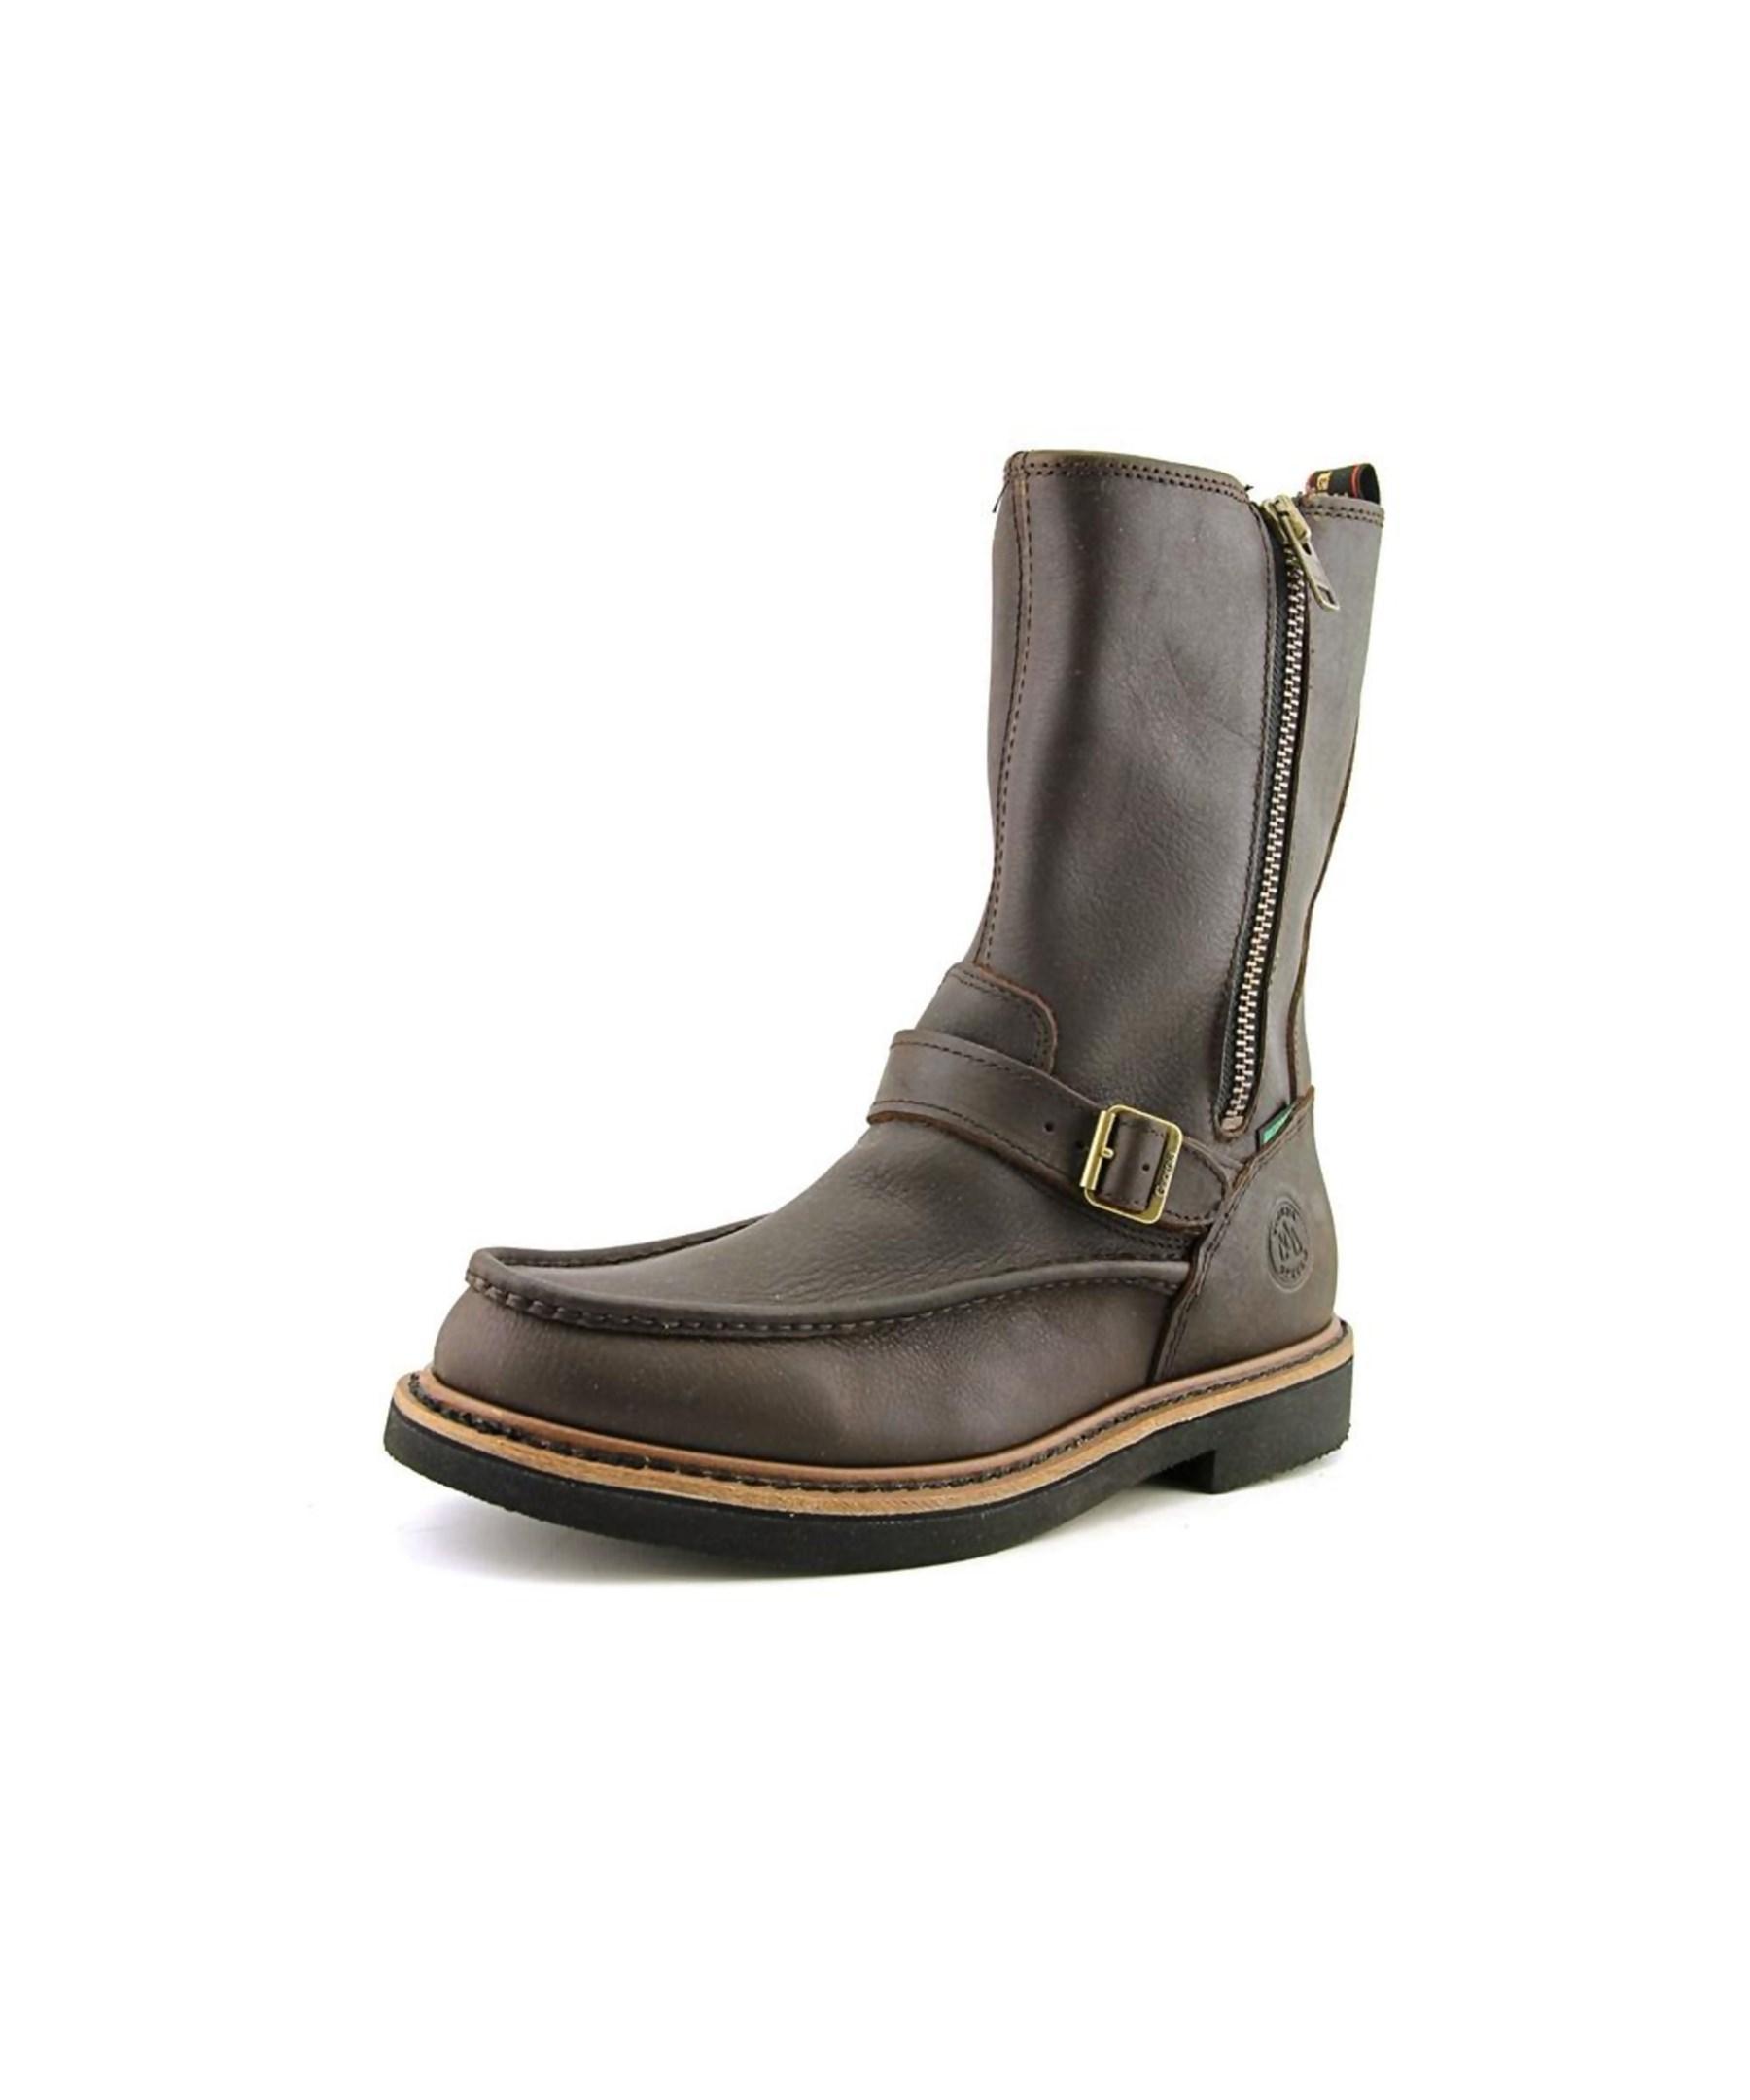 Georgia Boot Side Zip Moc Toe Wellington W Round Toe